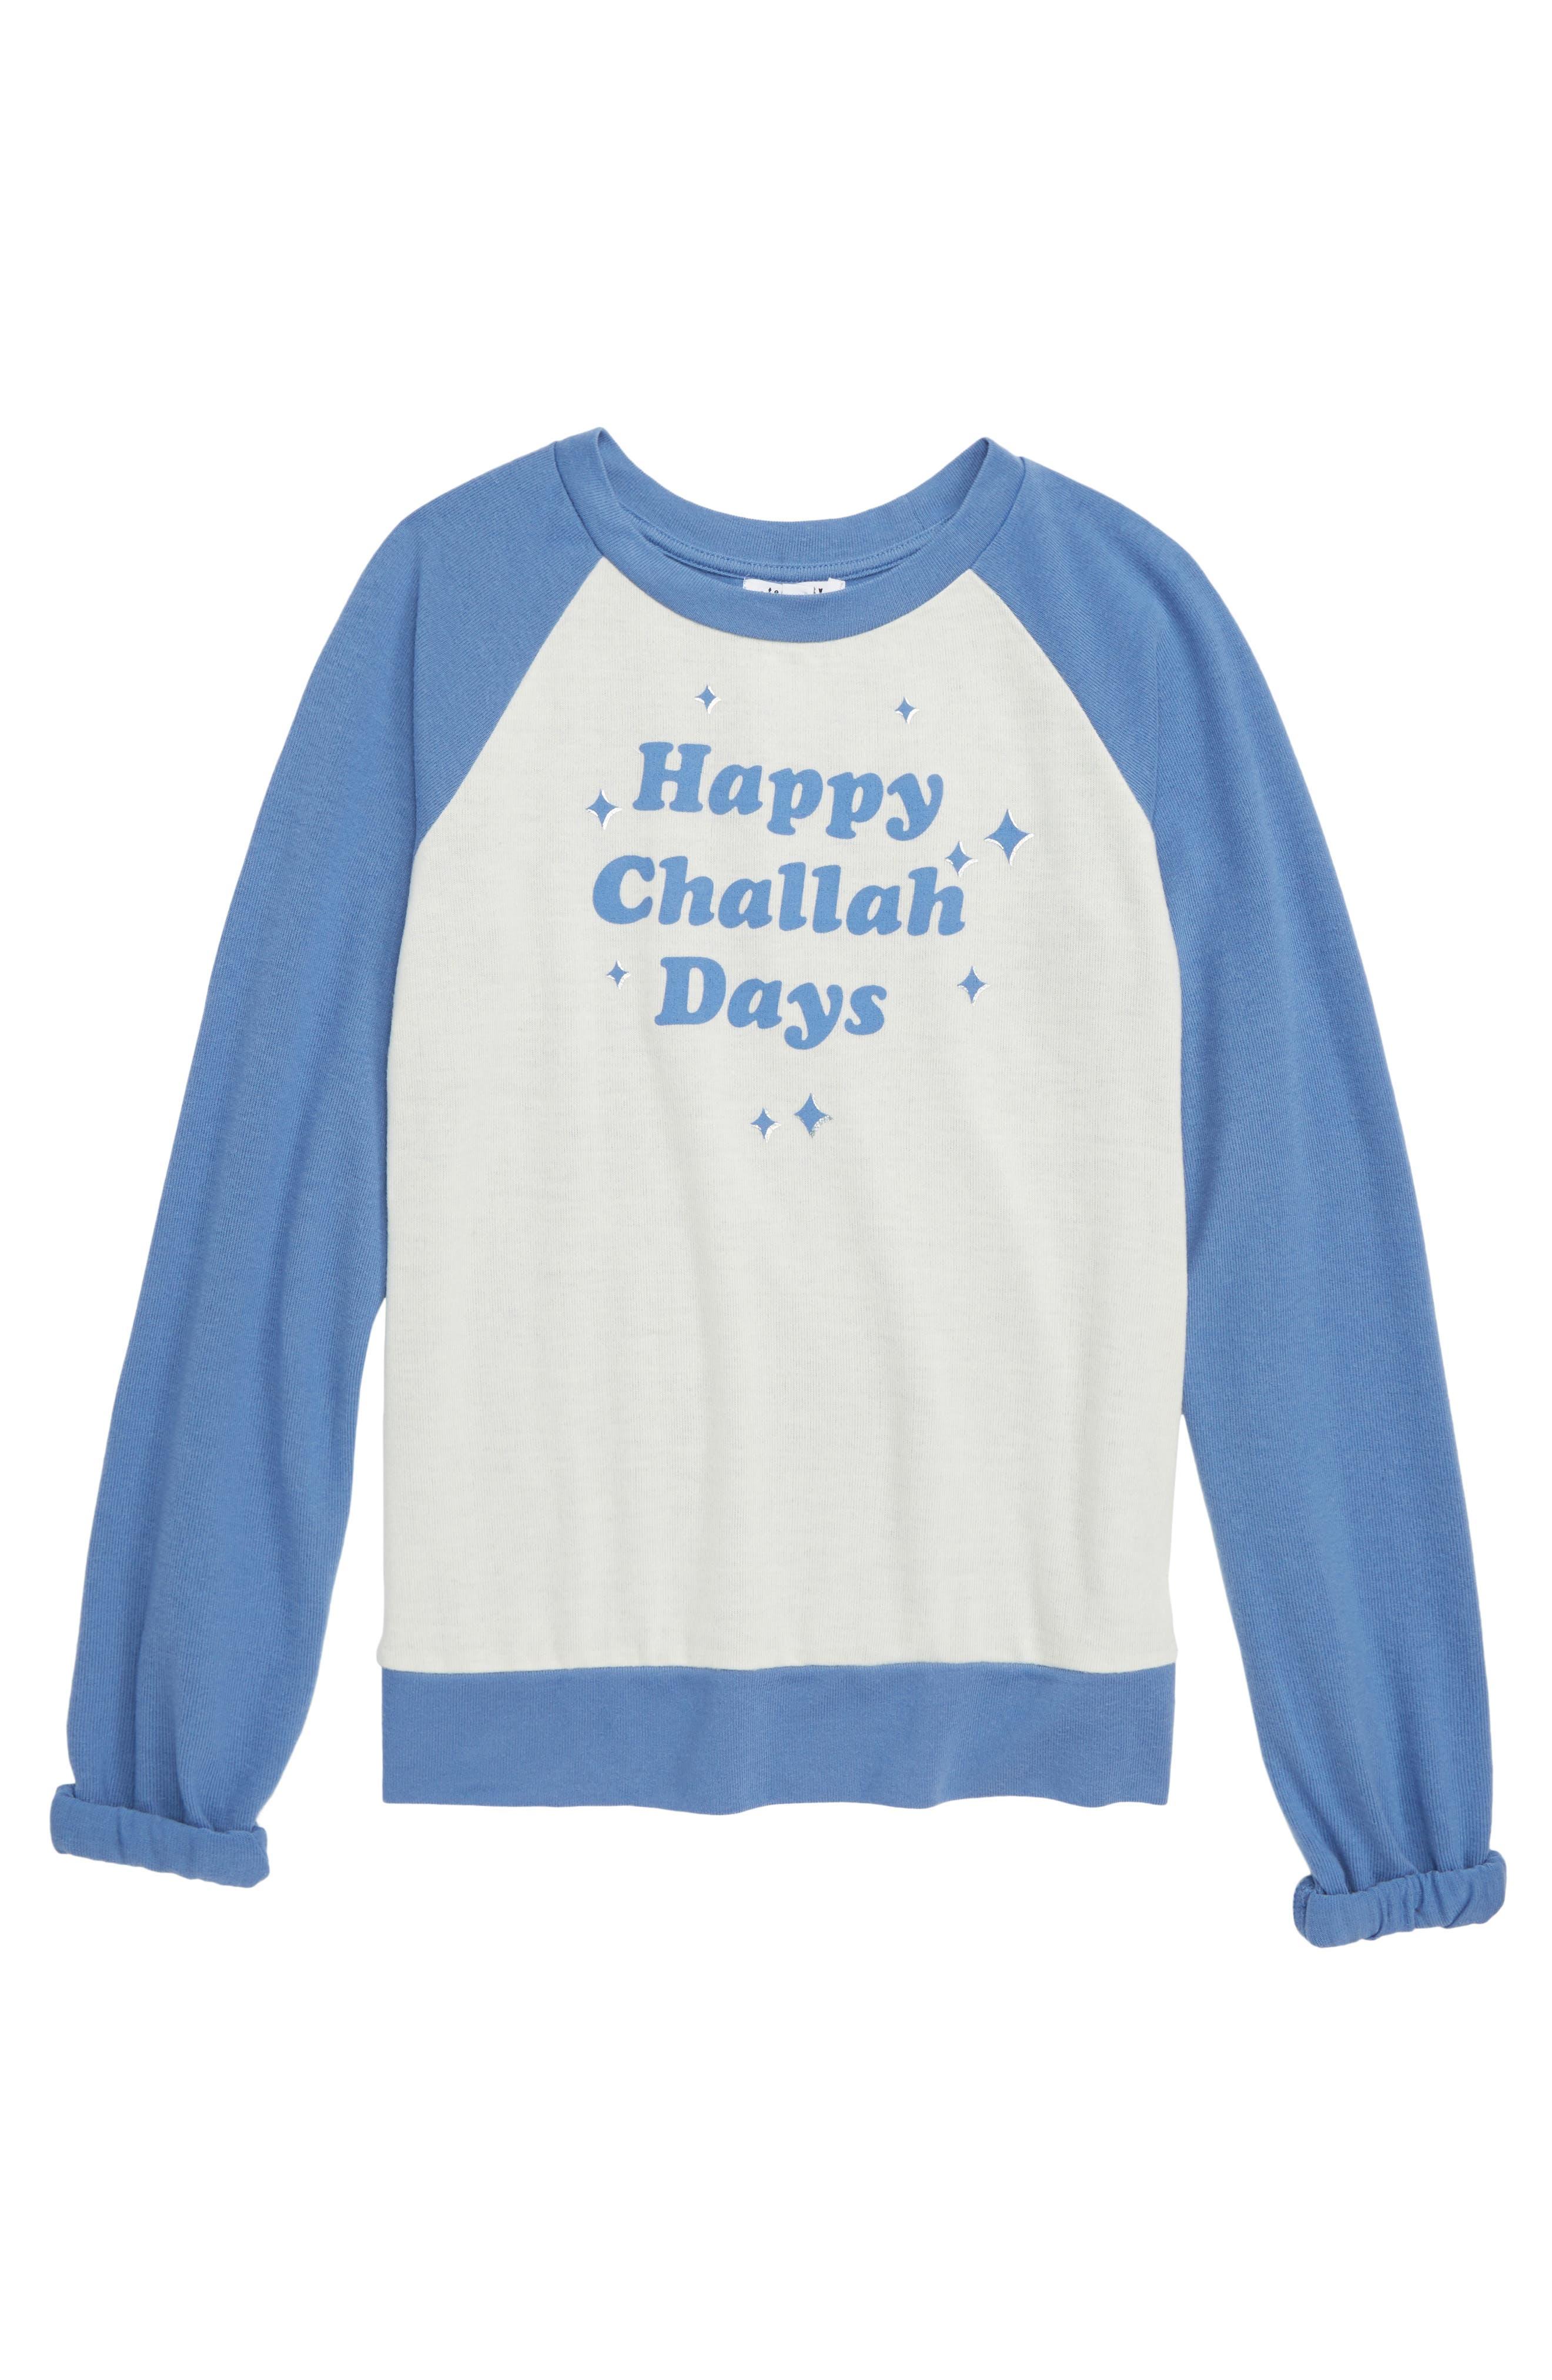 Happy Challah Days Baseball Tee,                         Main,                         color, BLUE/ IVORY